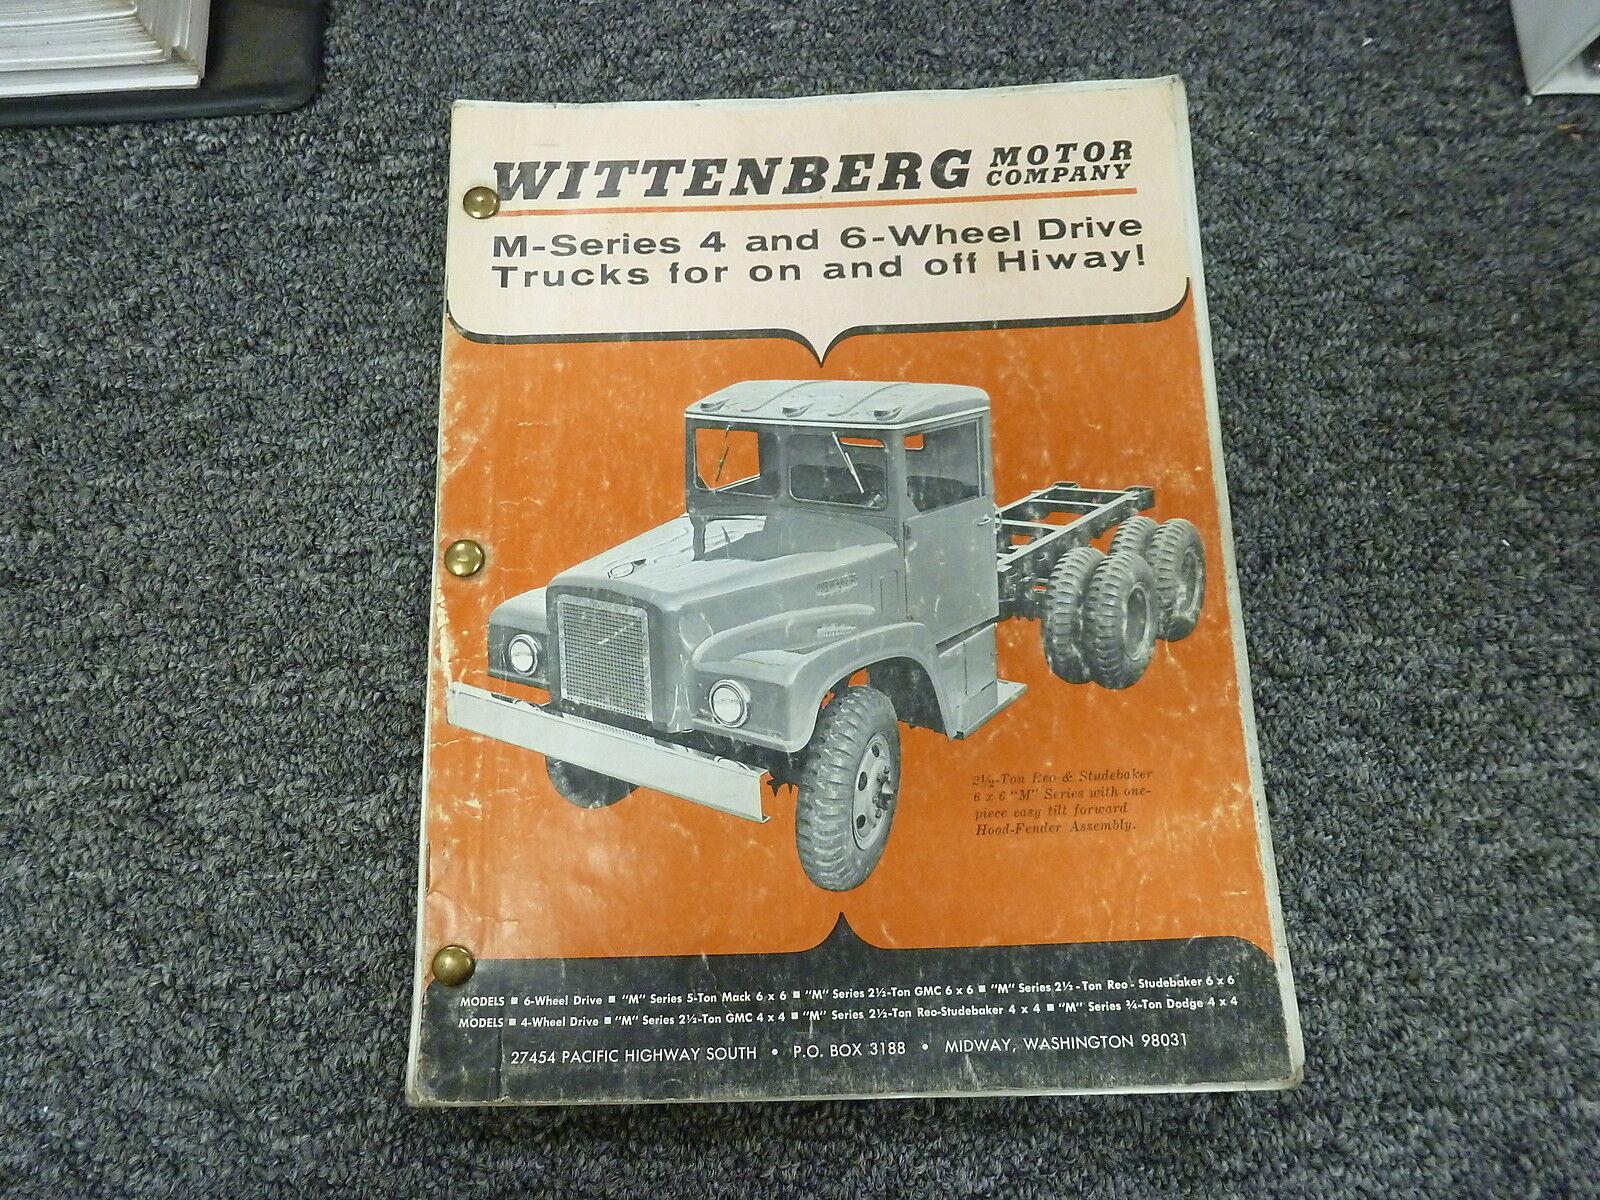 Wittenberg motor m series g744 g742 g741 g749 truck shop service repair manual